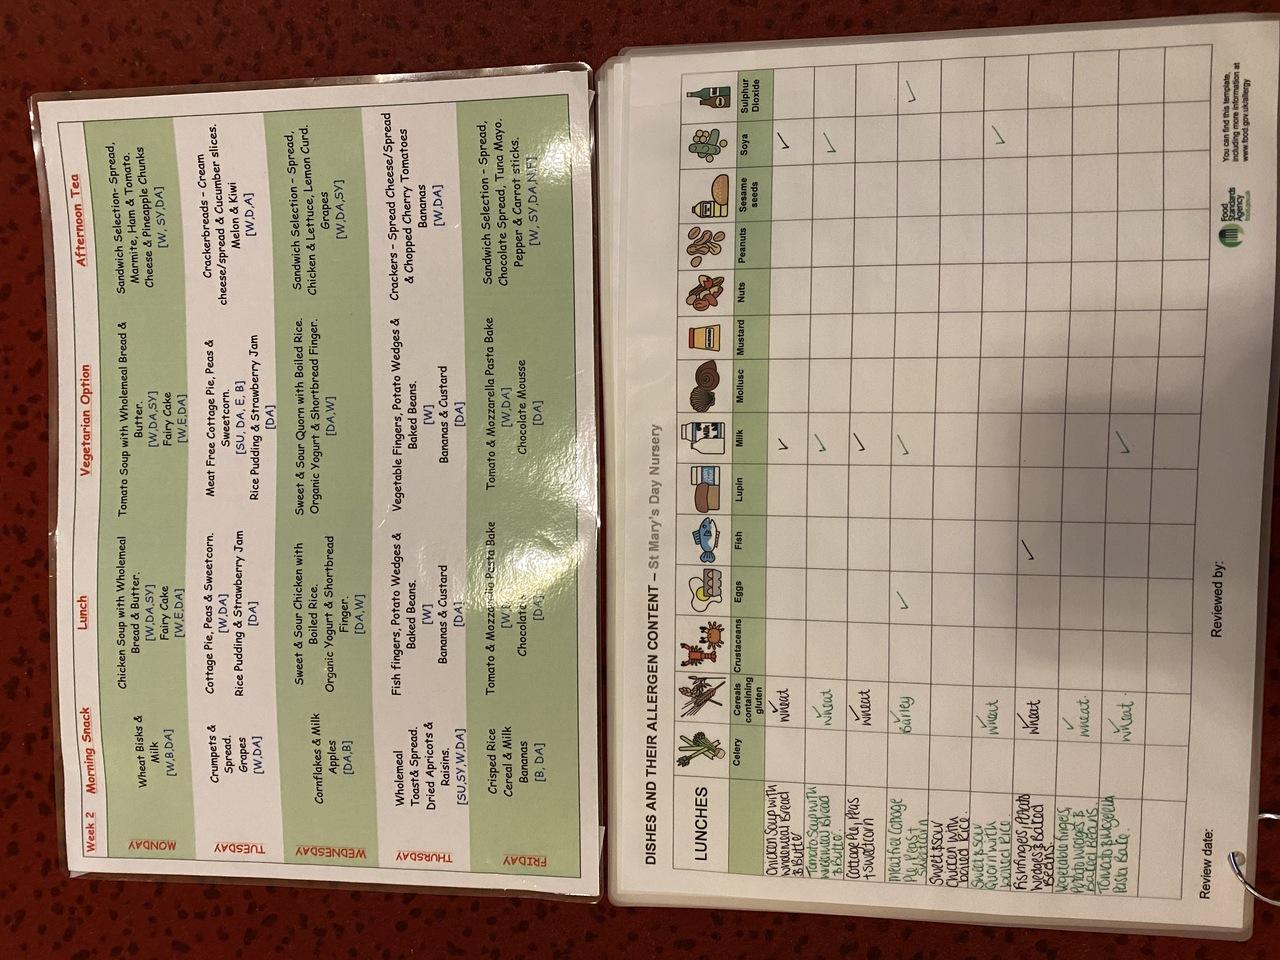 Example menu